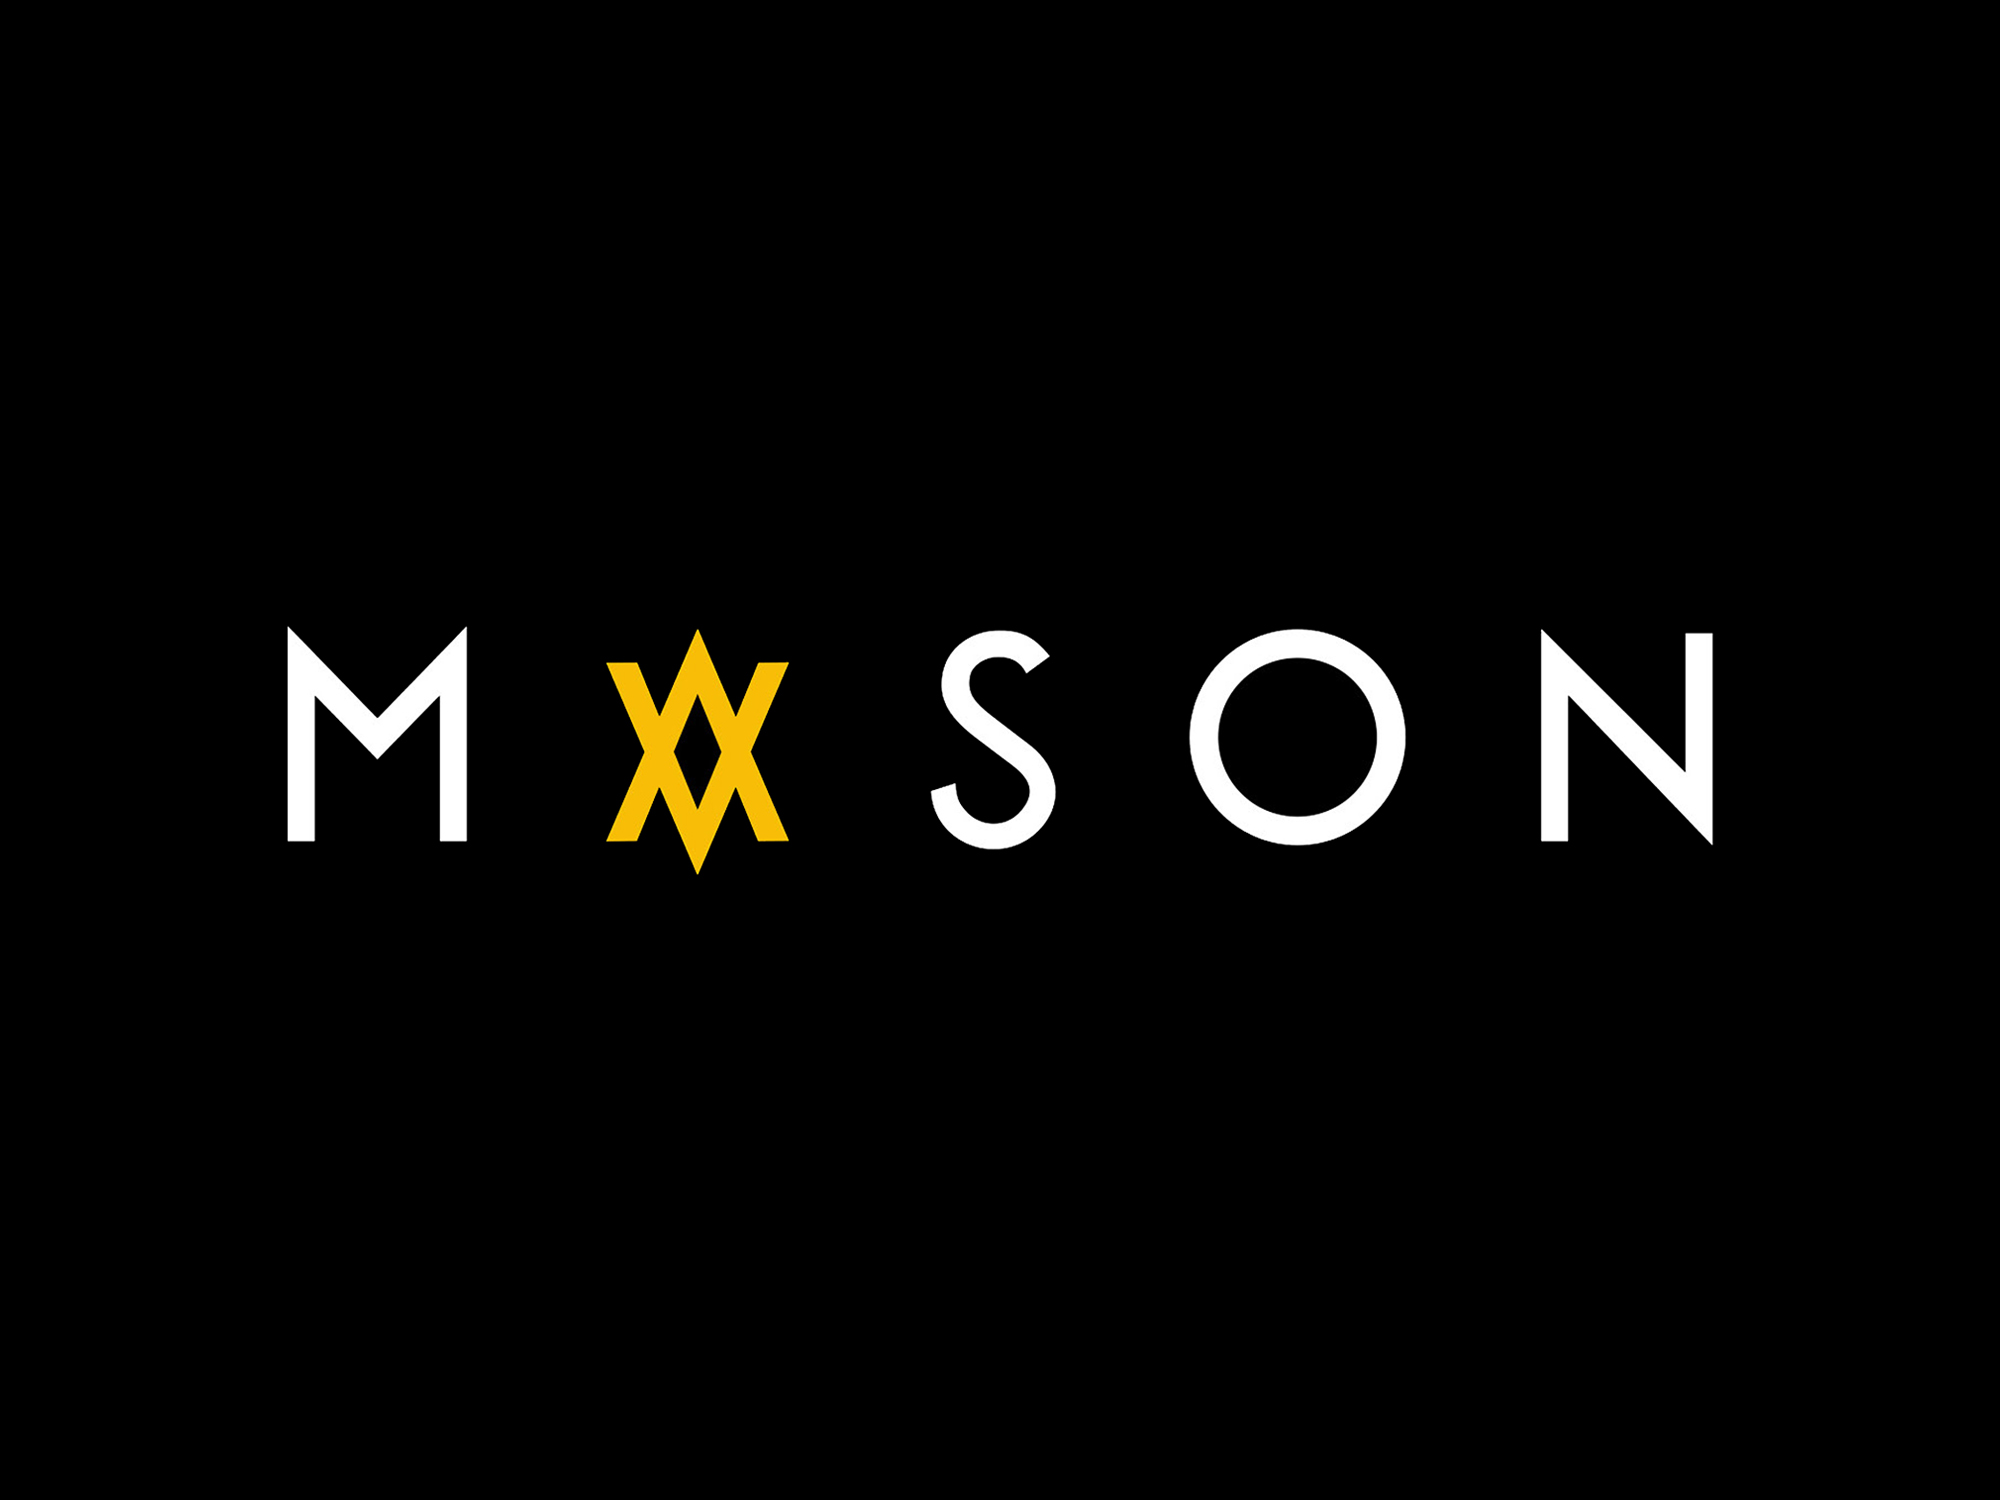 Cover image: Mason